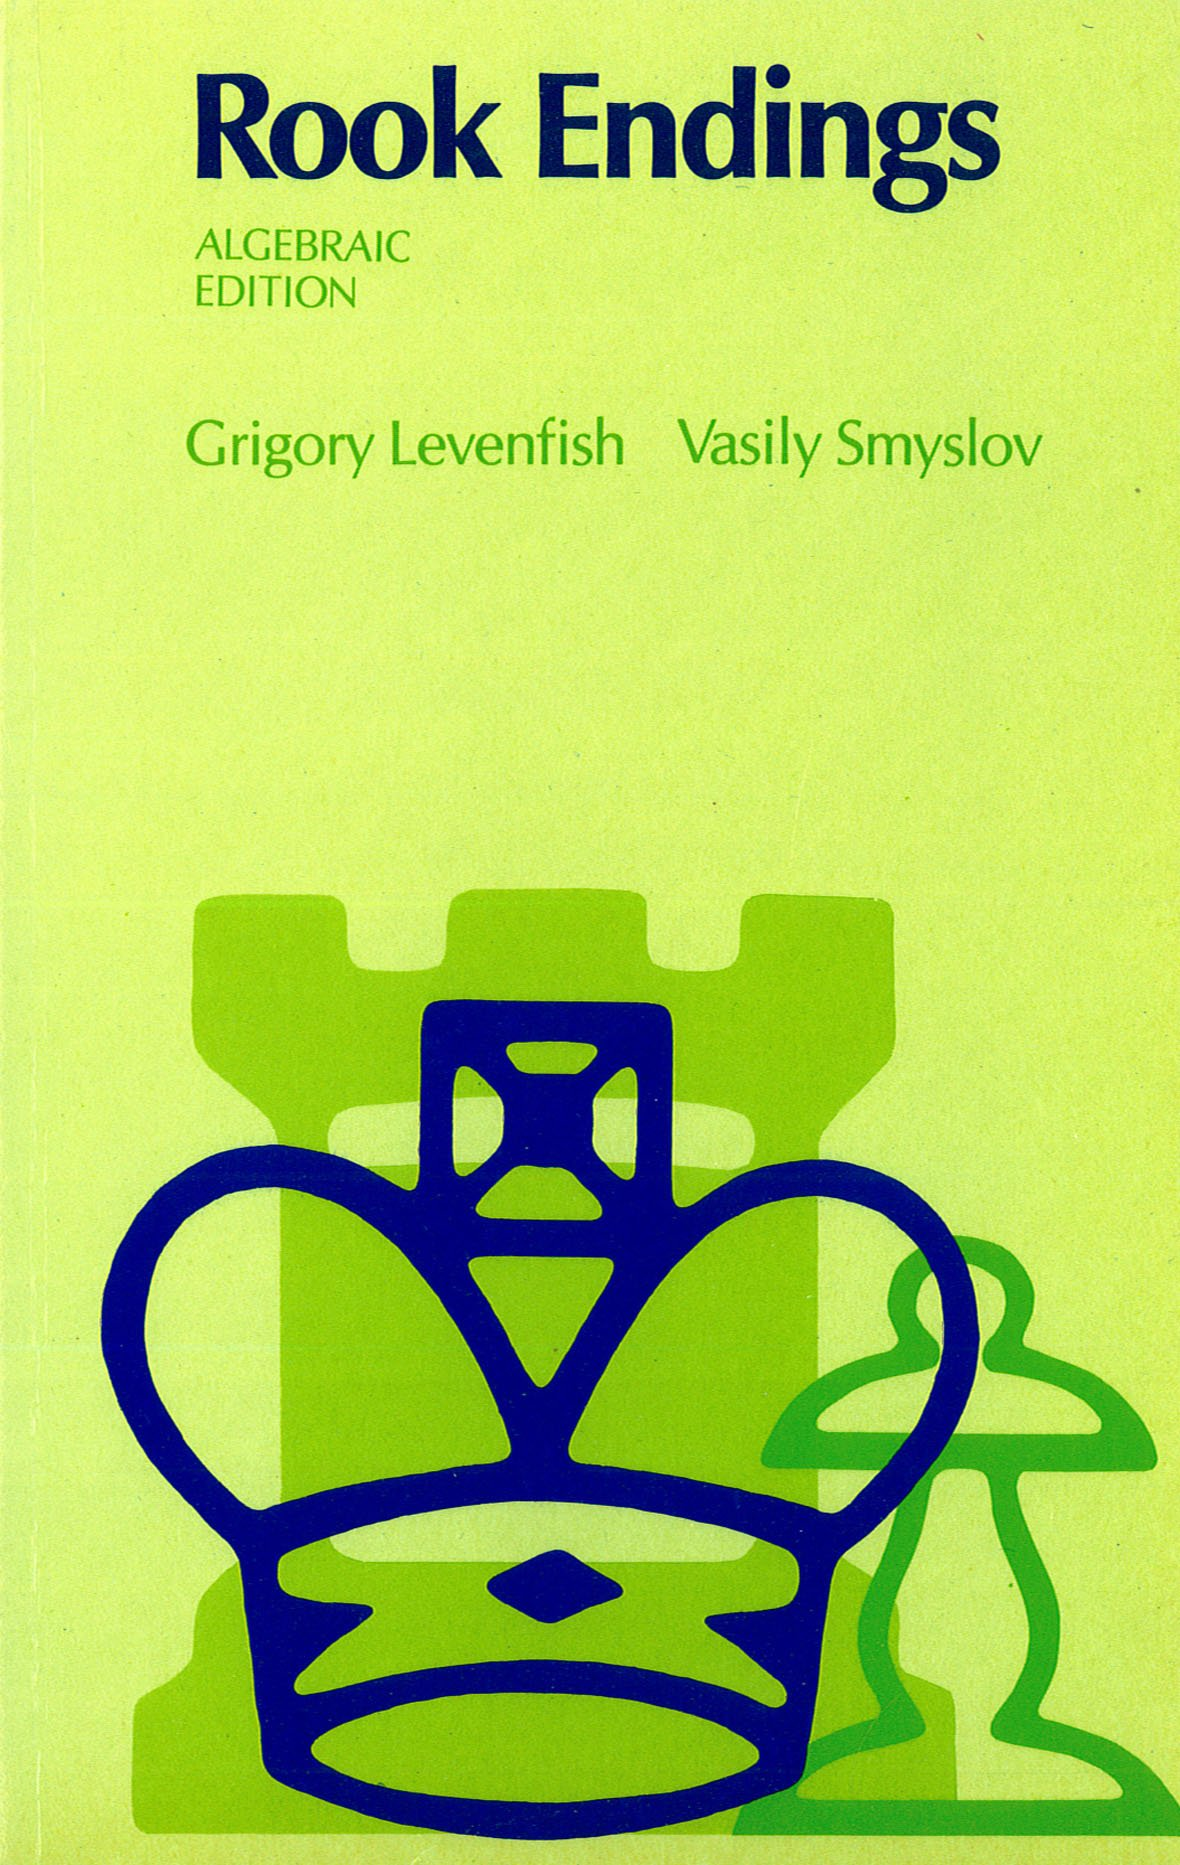 Rook Endings (Tournament Player's Collection): Grigory Levenfish, Vasily  Smyslov: 9780713458091: Amazon.com: Books